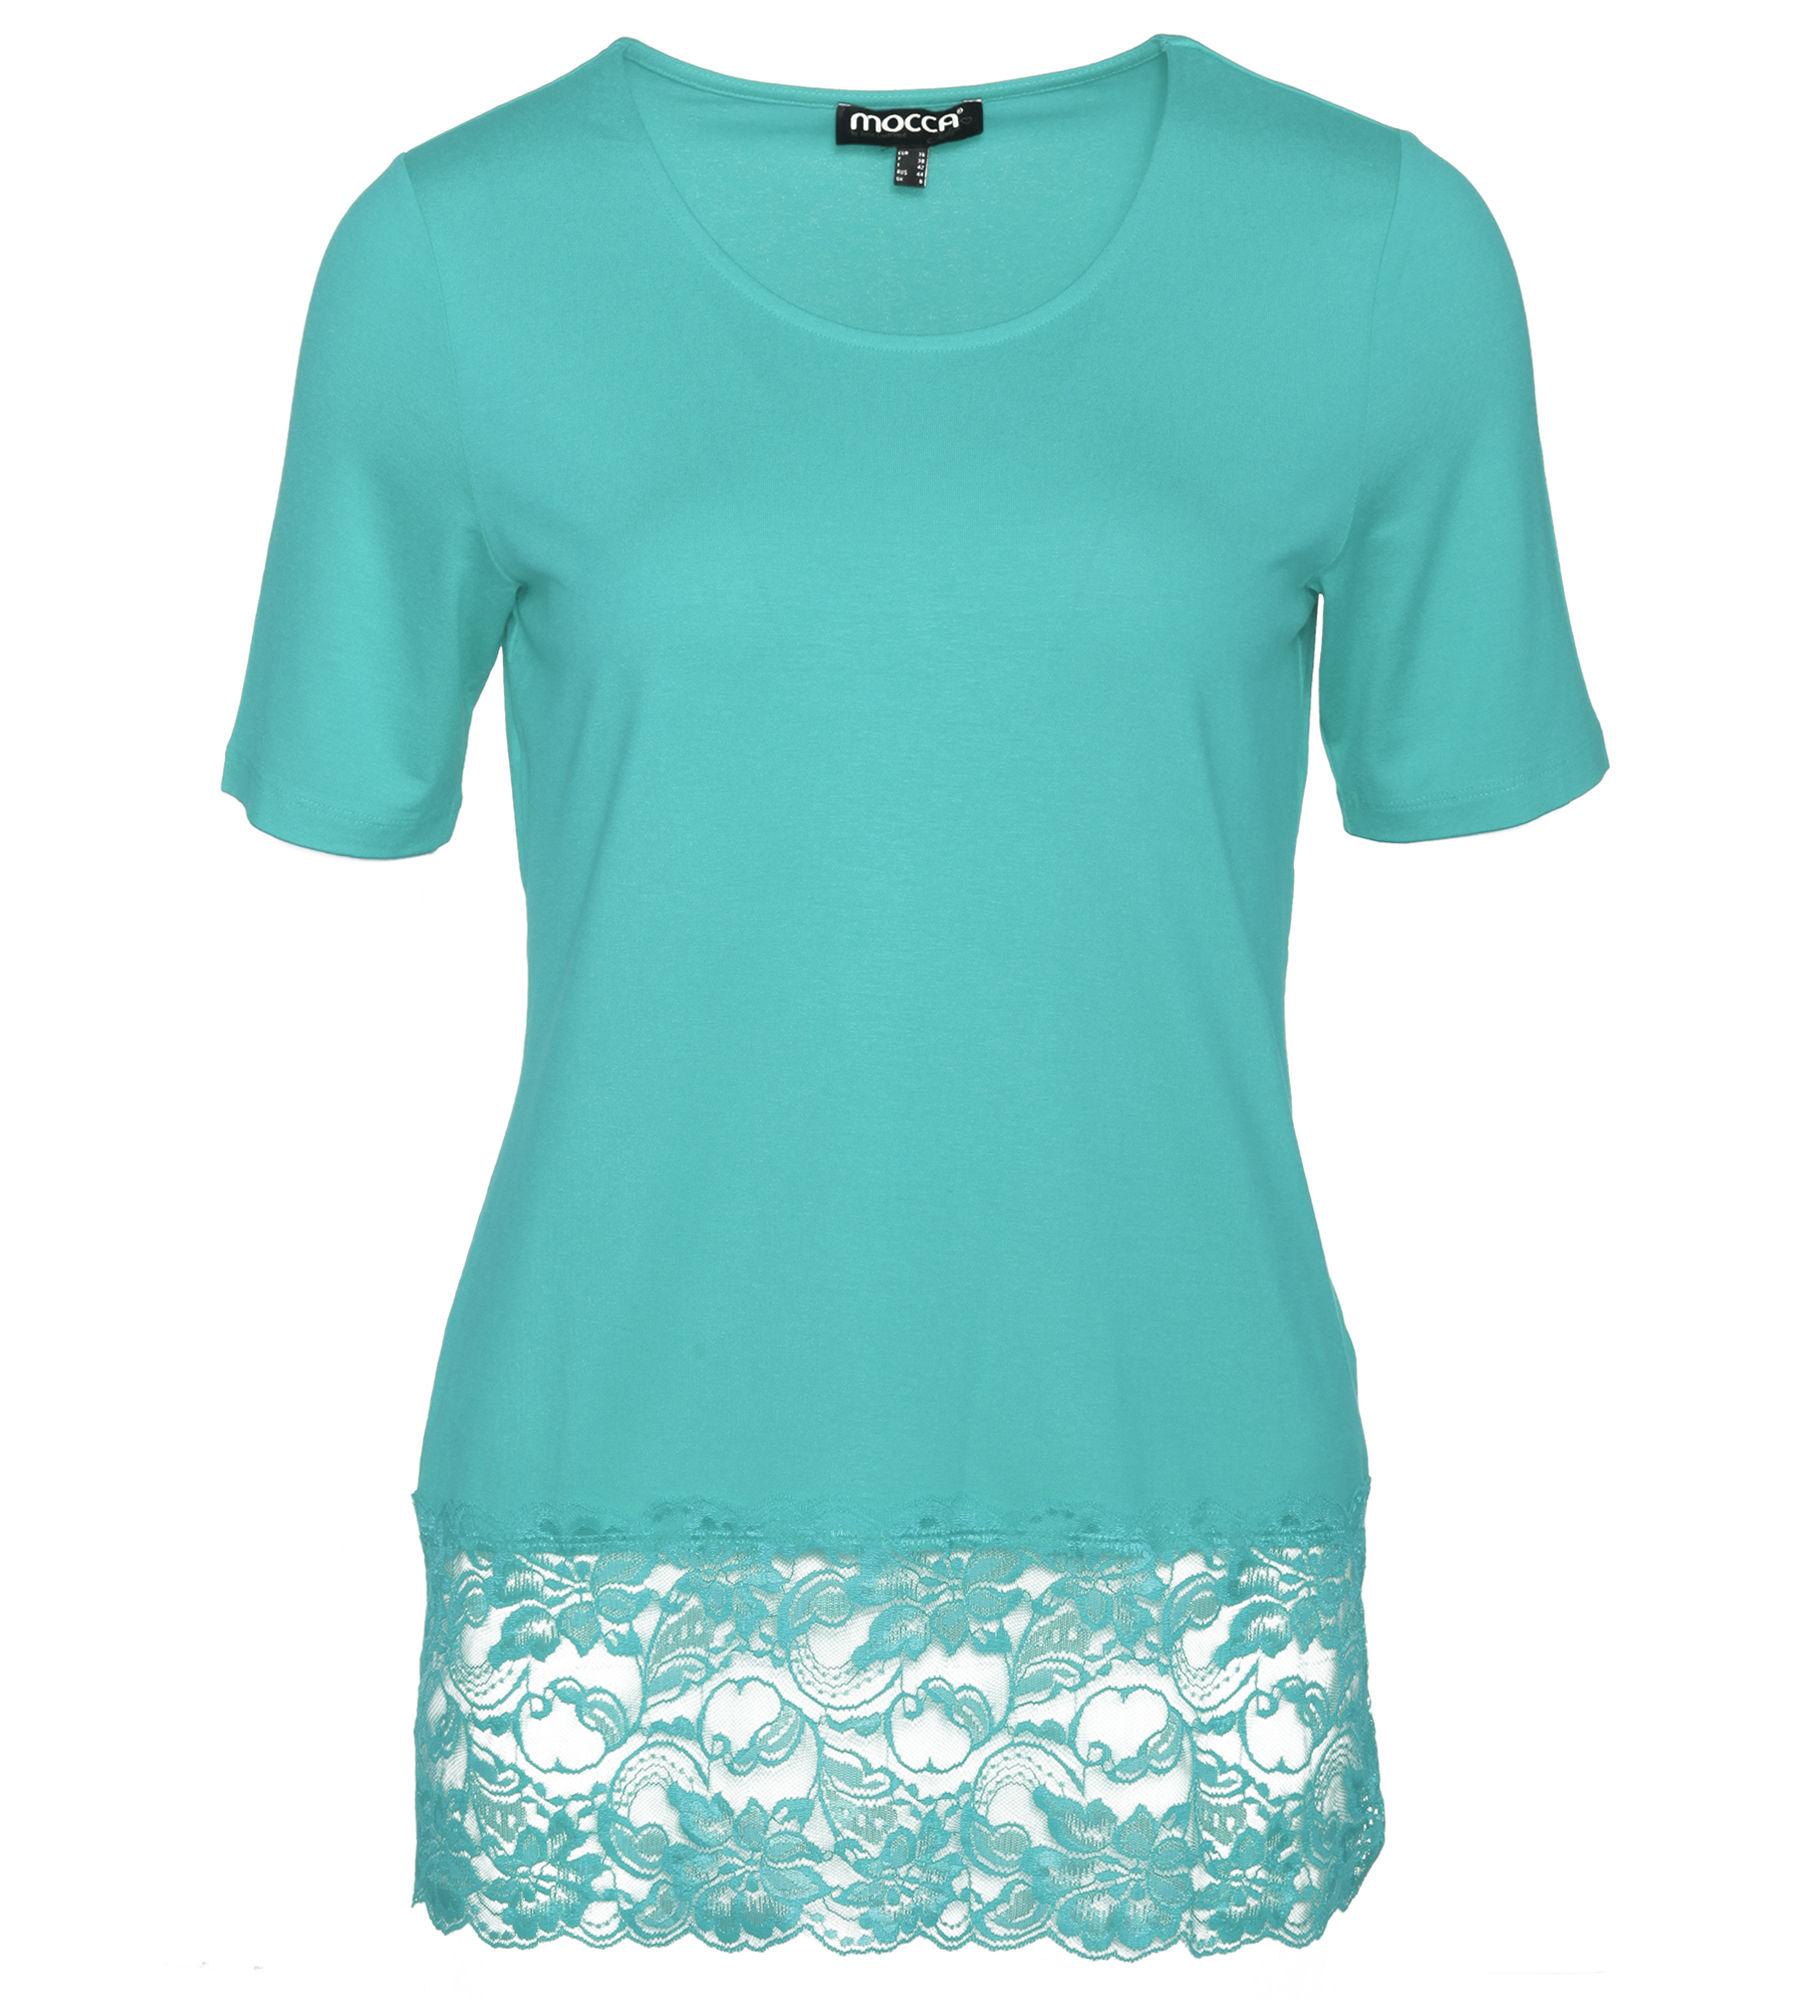 1/2-Arm Shirt mit Spitzenborte  36 aqua